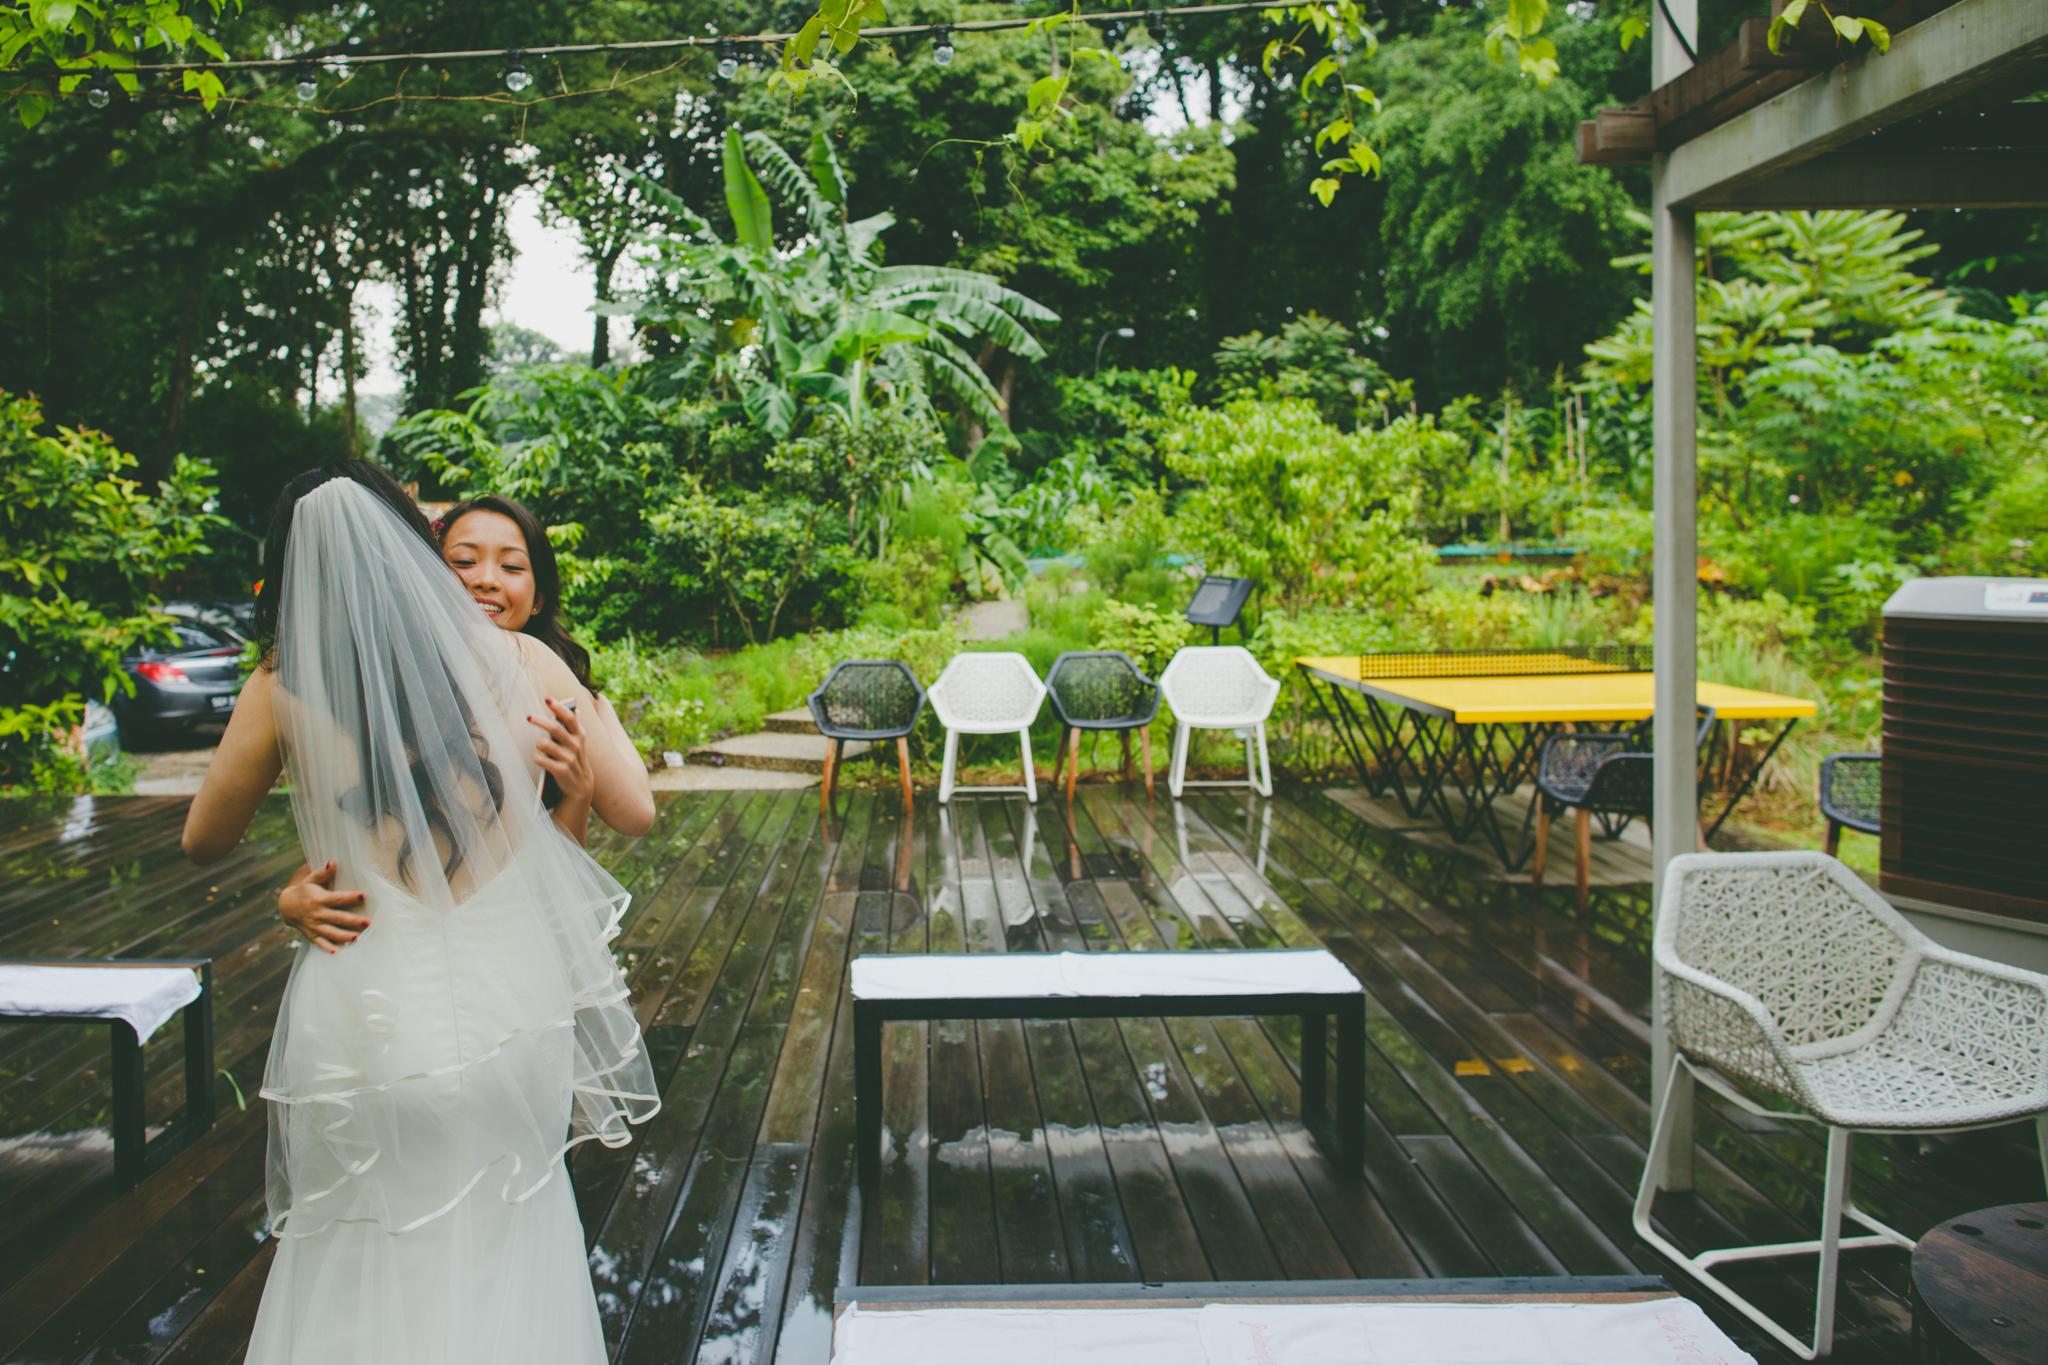 Amy Sampson Devon Wedding Photographer   Destination Wedding Photographer